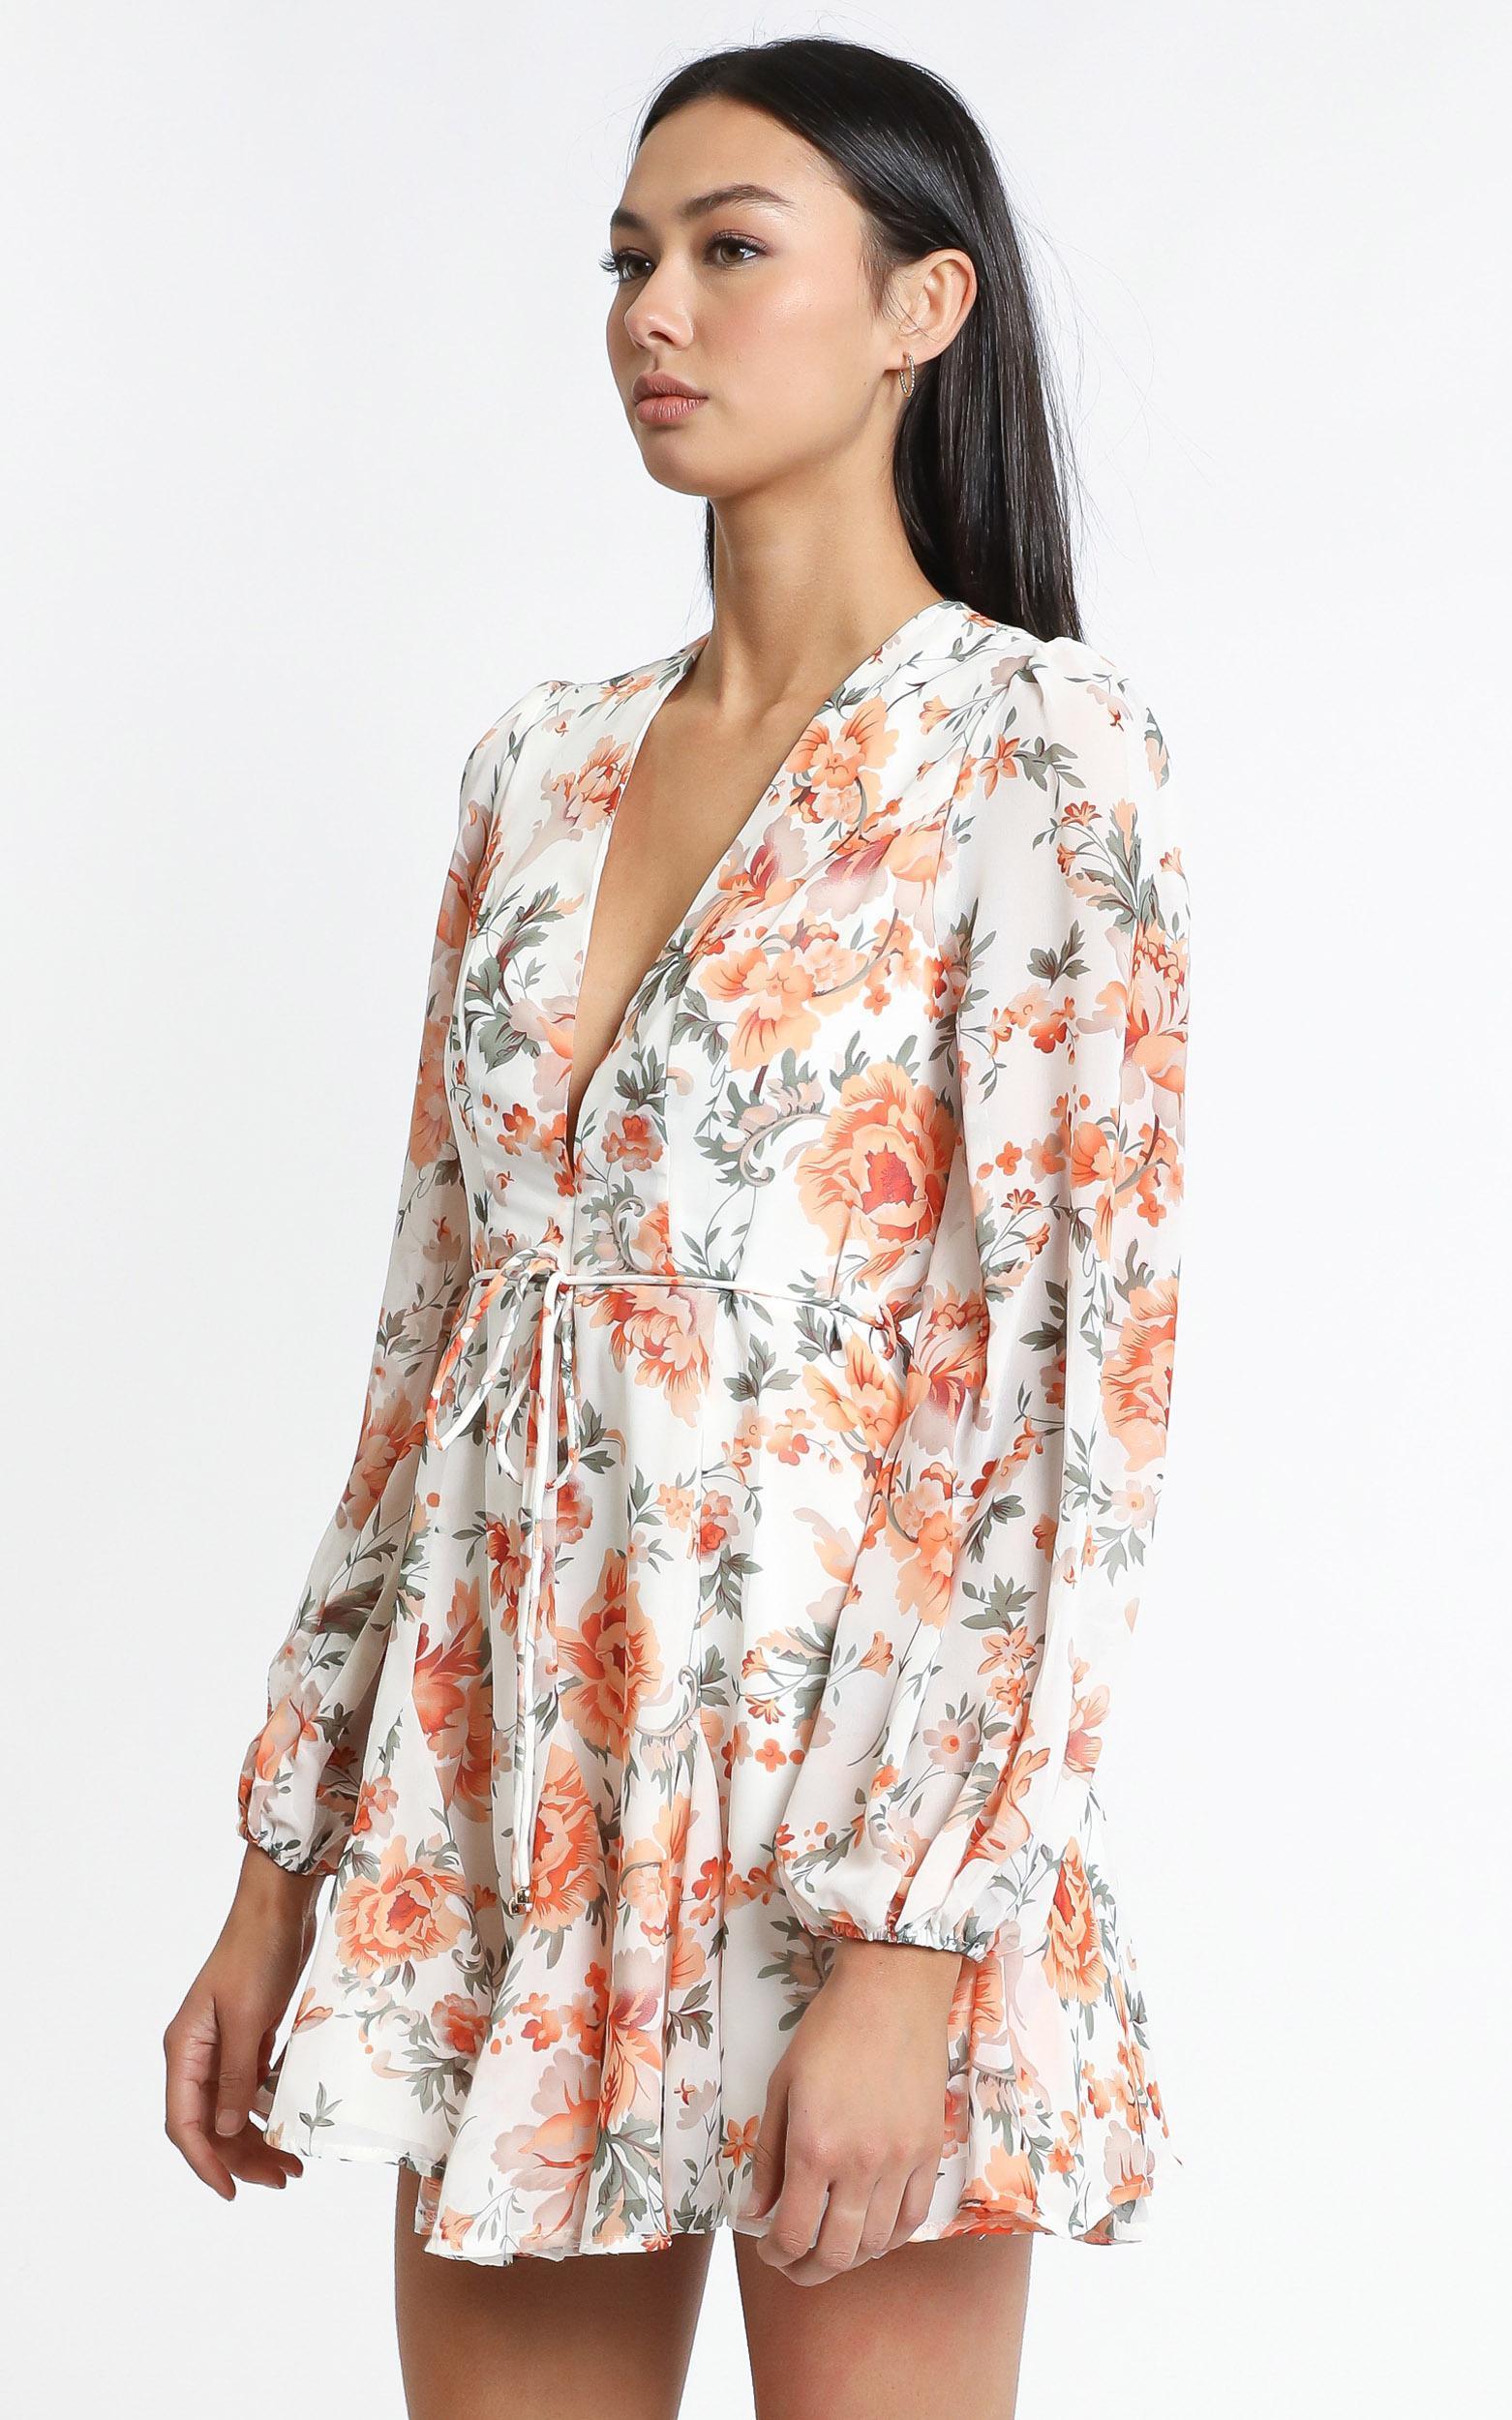 Delano Dress in Orange Print - 12 (L), Orange, hi-res image number null